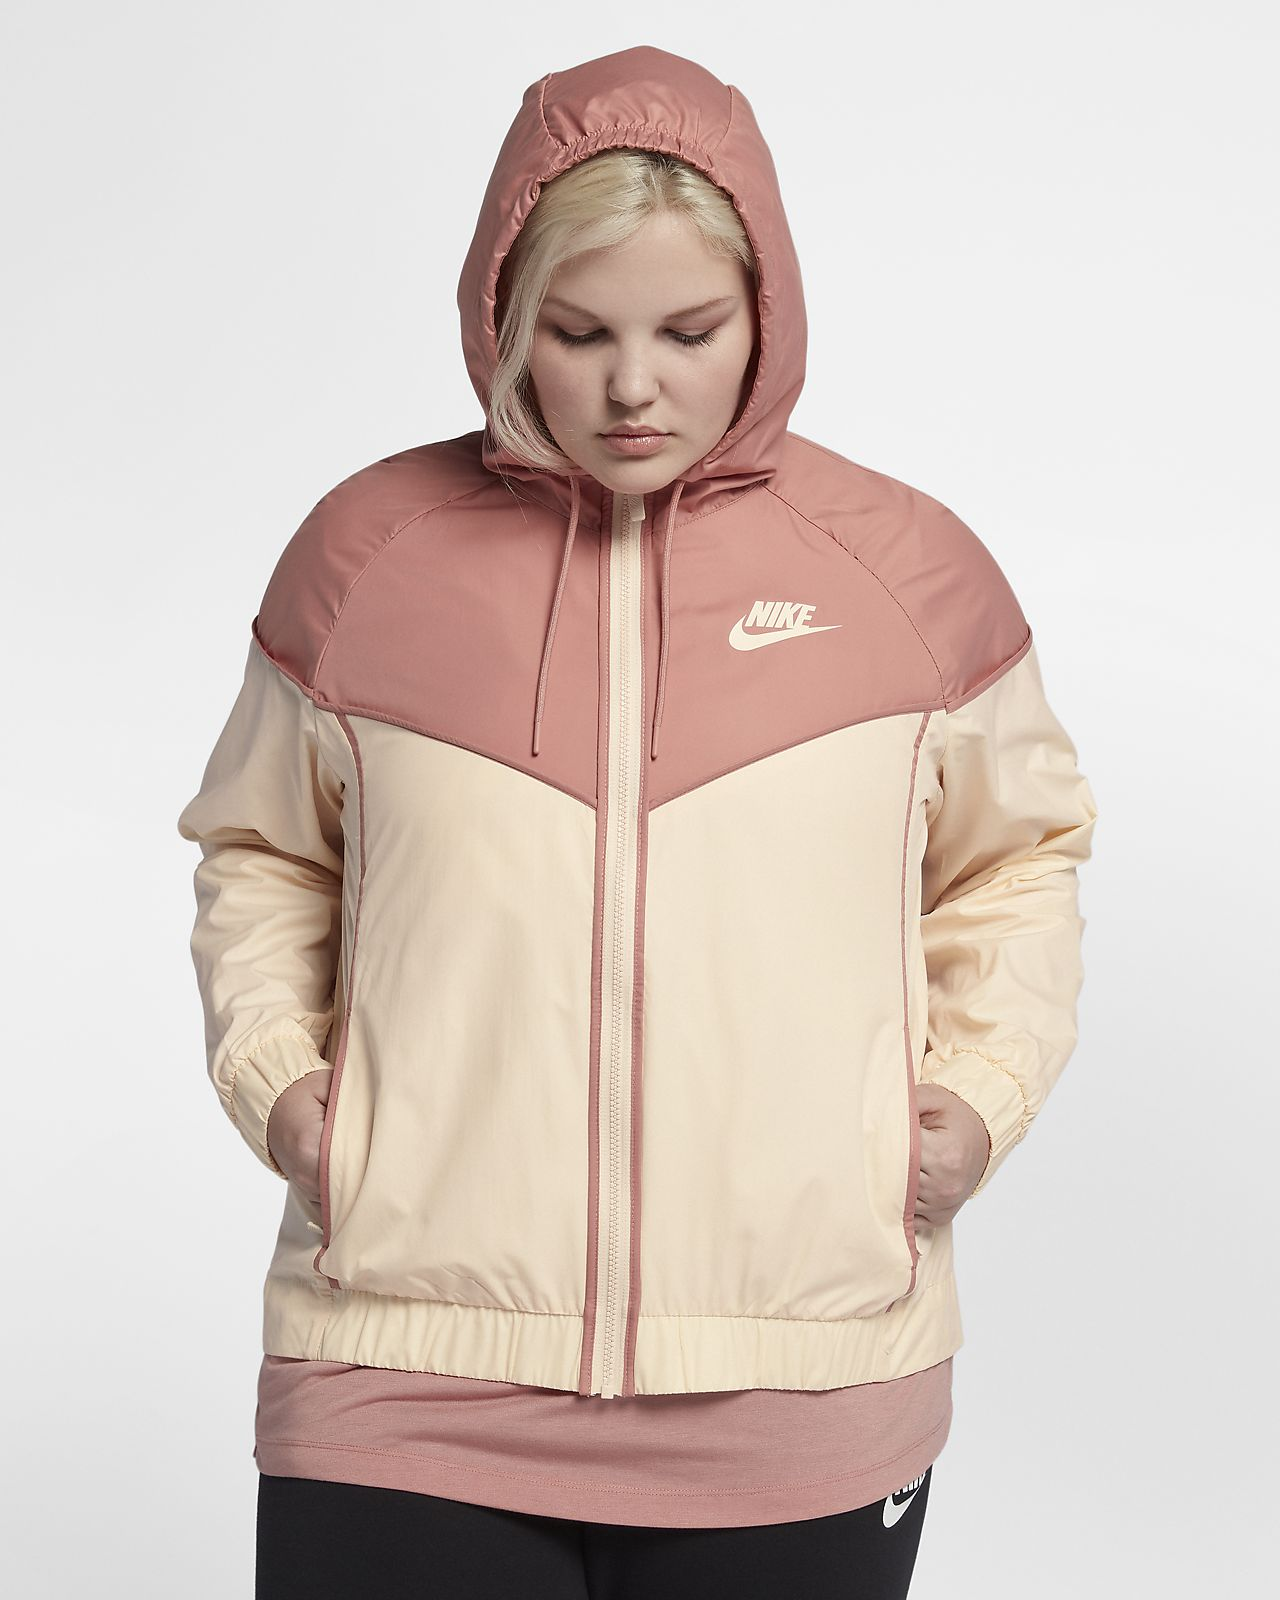 bc8f4d3c252 Nike Sportswear Windrunner (Plus Size) Women s Jacket. Nike.com CA